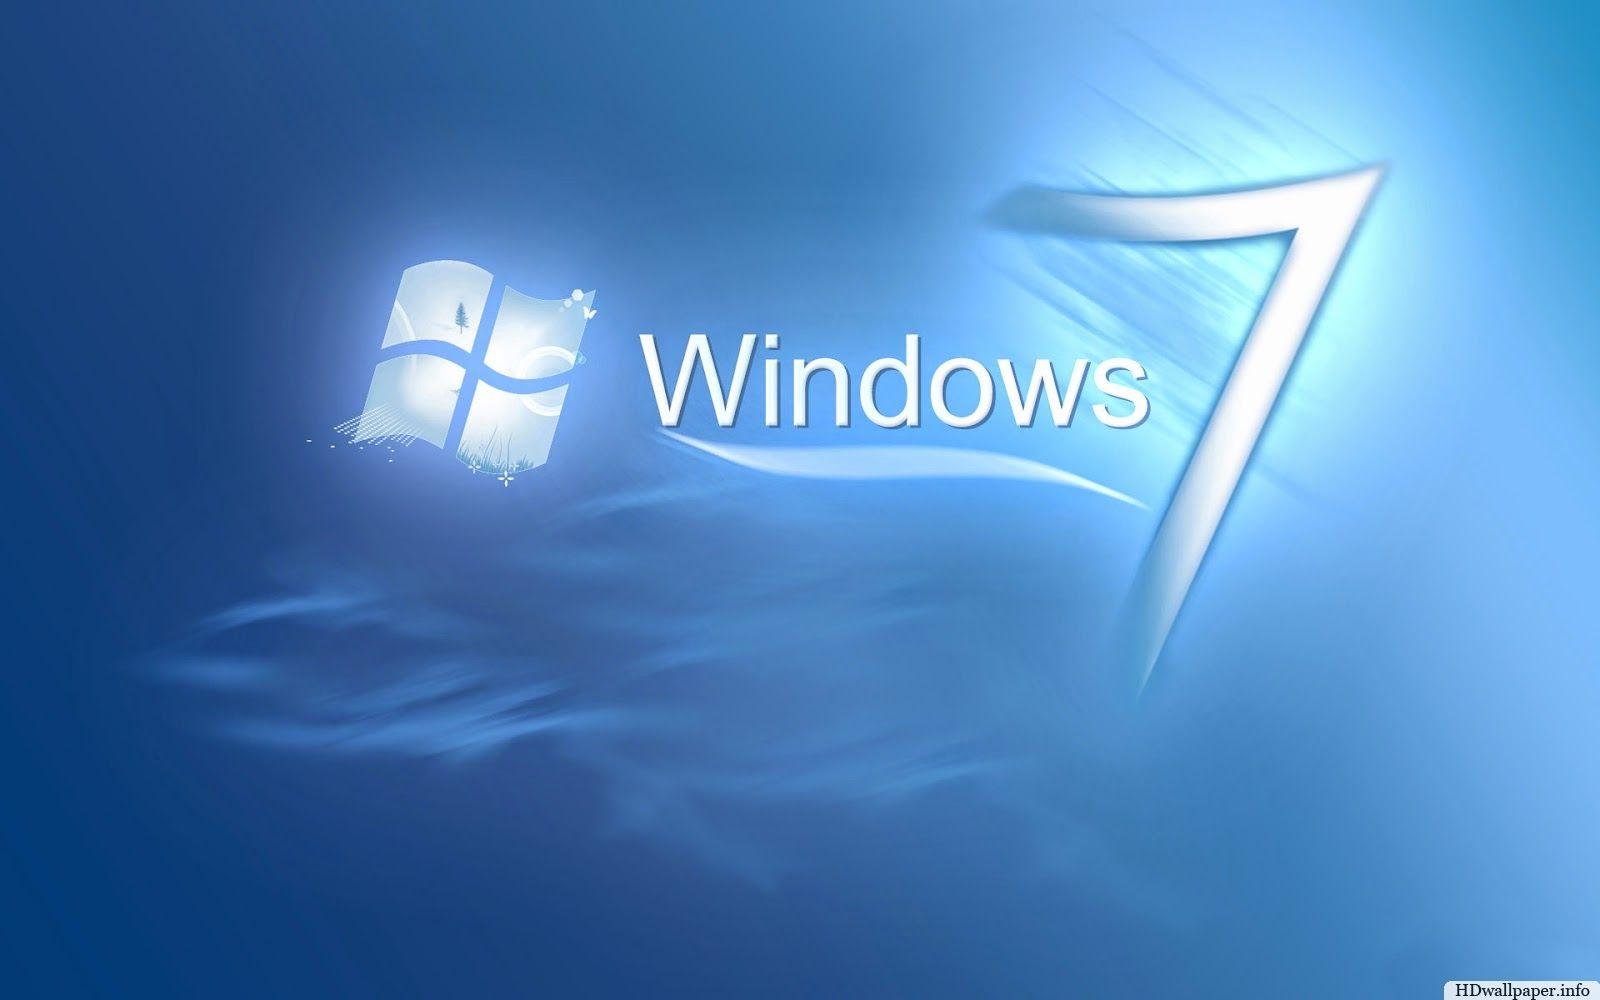 Wallpaper Hd For Desktop Full Screen Windows 7 Download Http Hdwallpaper Info Wallpaper Hd Windows Desktop Wallpaper Nature Desktop Wallpaper Windows Seven